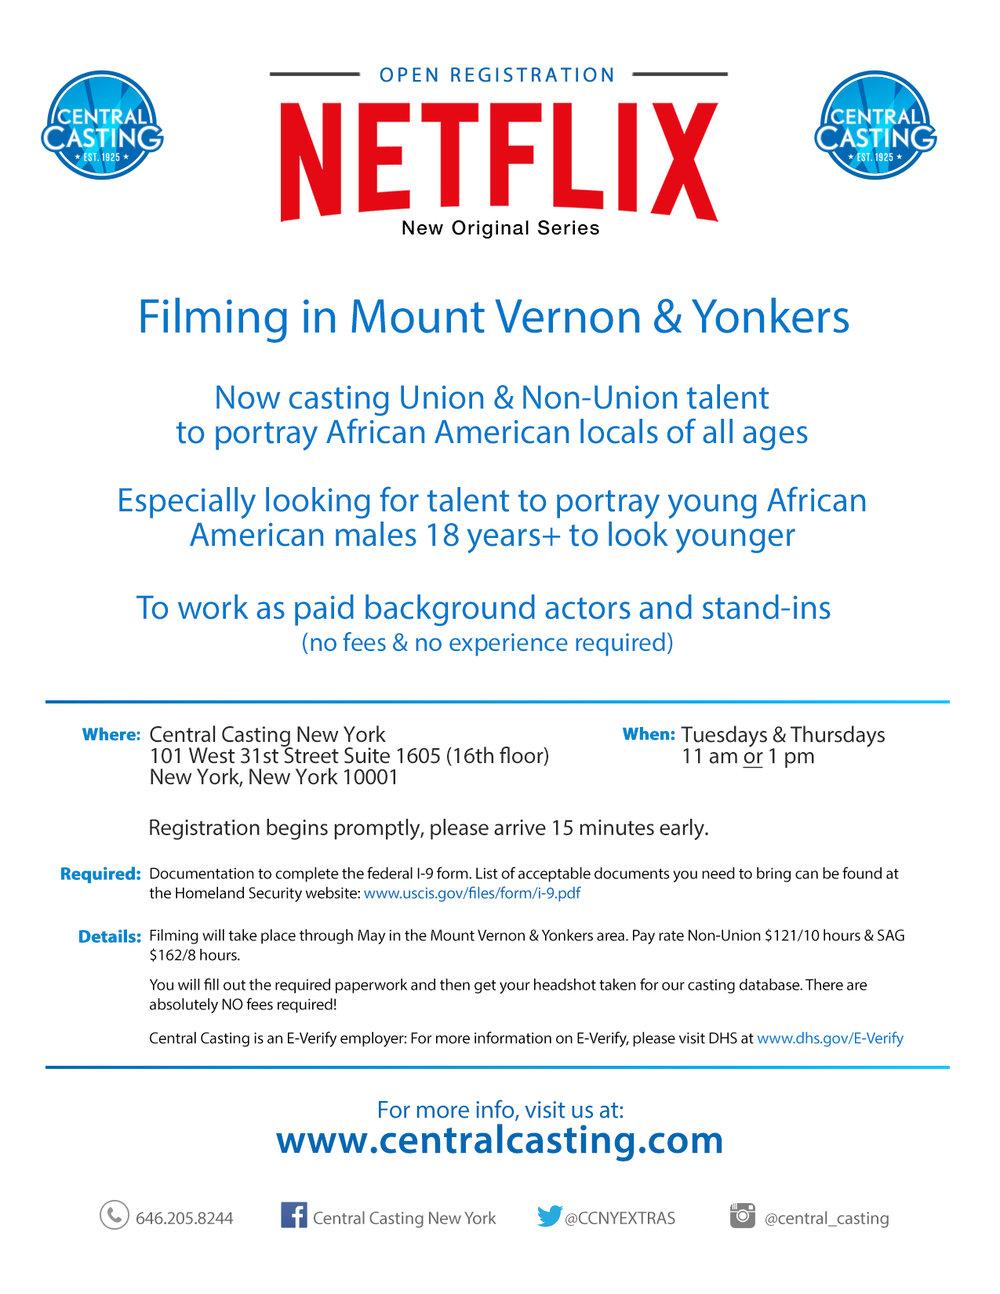 netflix-yonkers-mount-vernon-casting